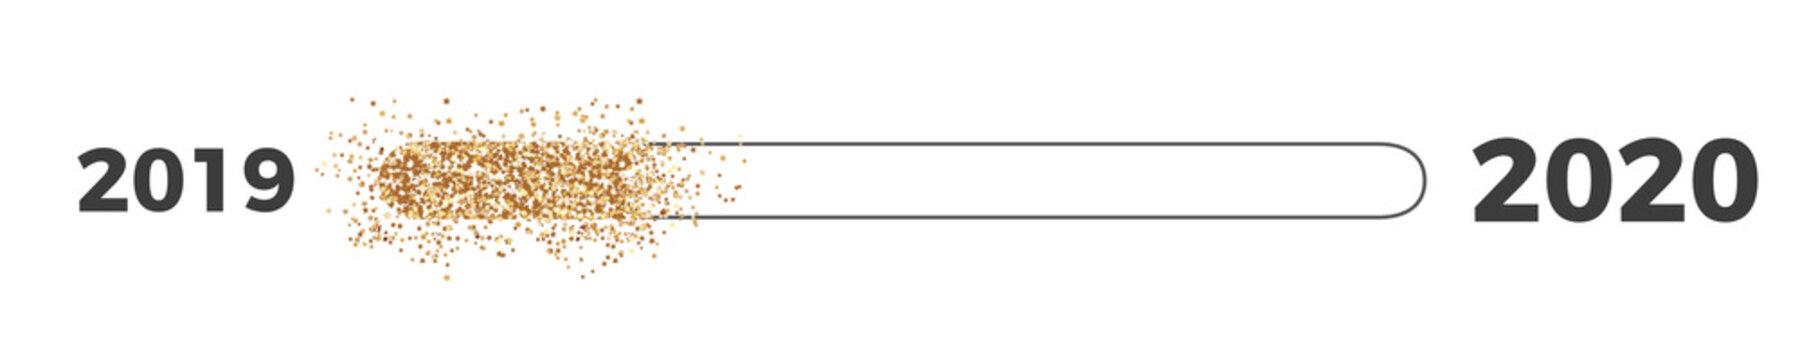 2019 to 2020 Loading Bar Gold on transparent background